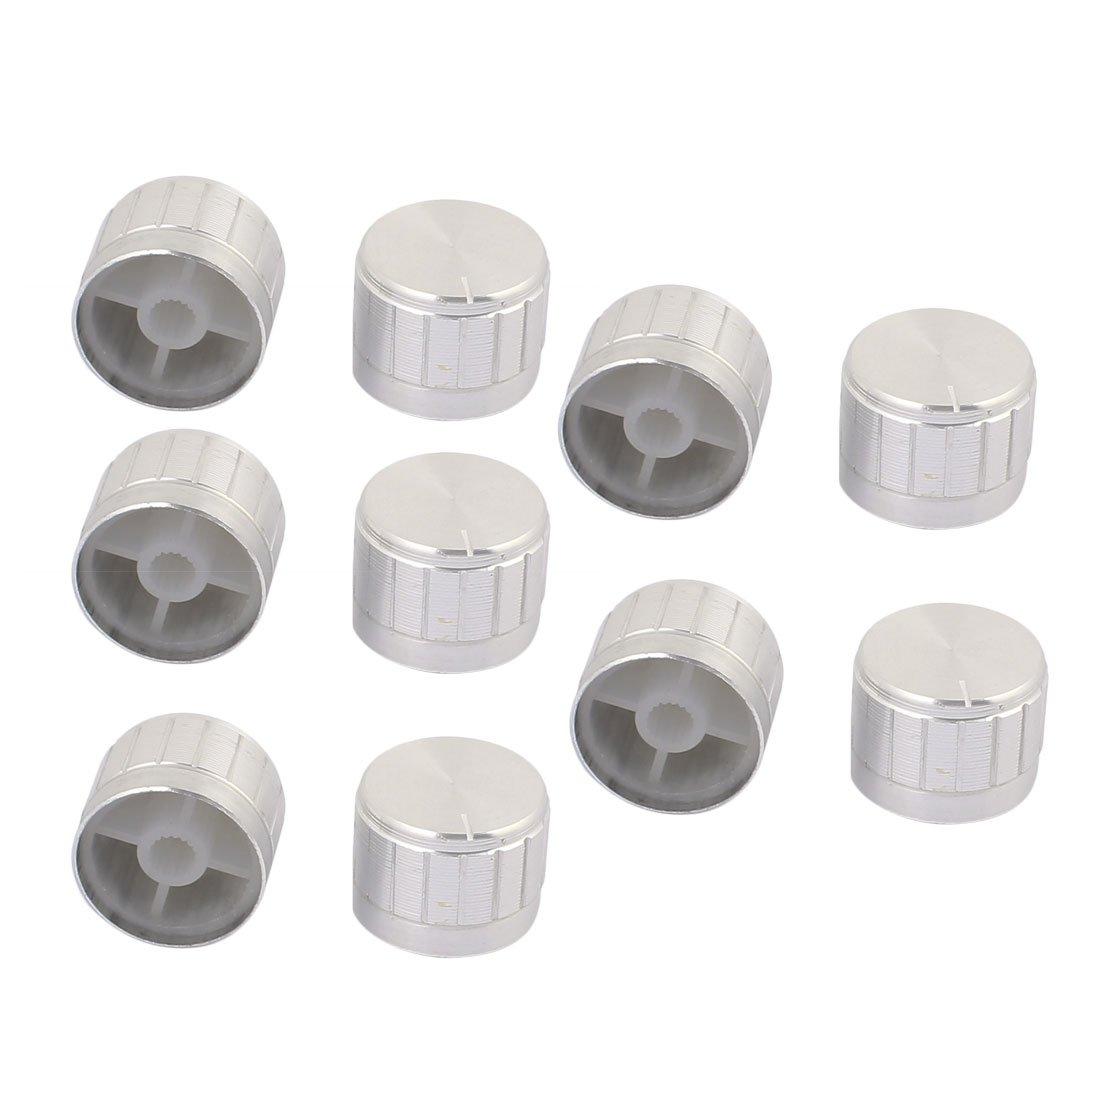 10PCS Black Aluminum 6mm Knurled Shaft Knob For Potentiometer Volume Control